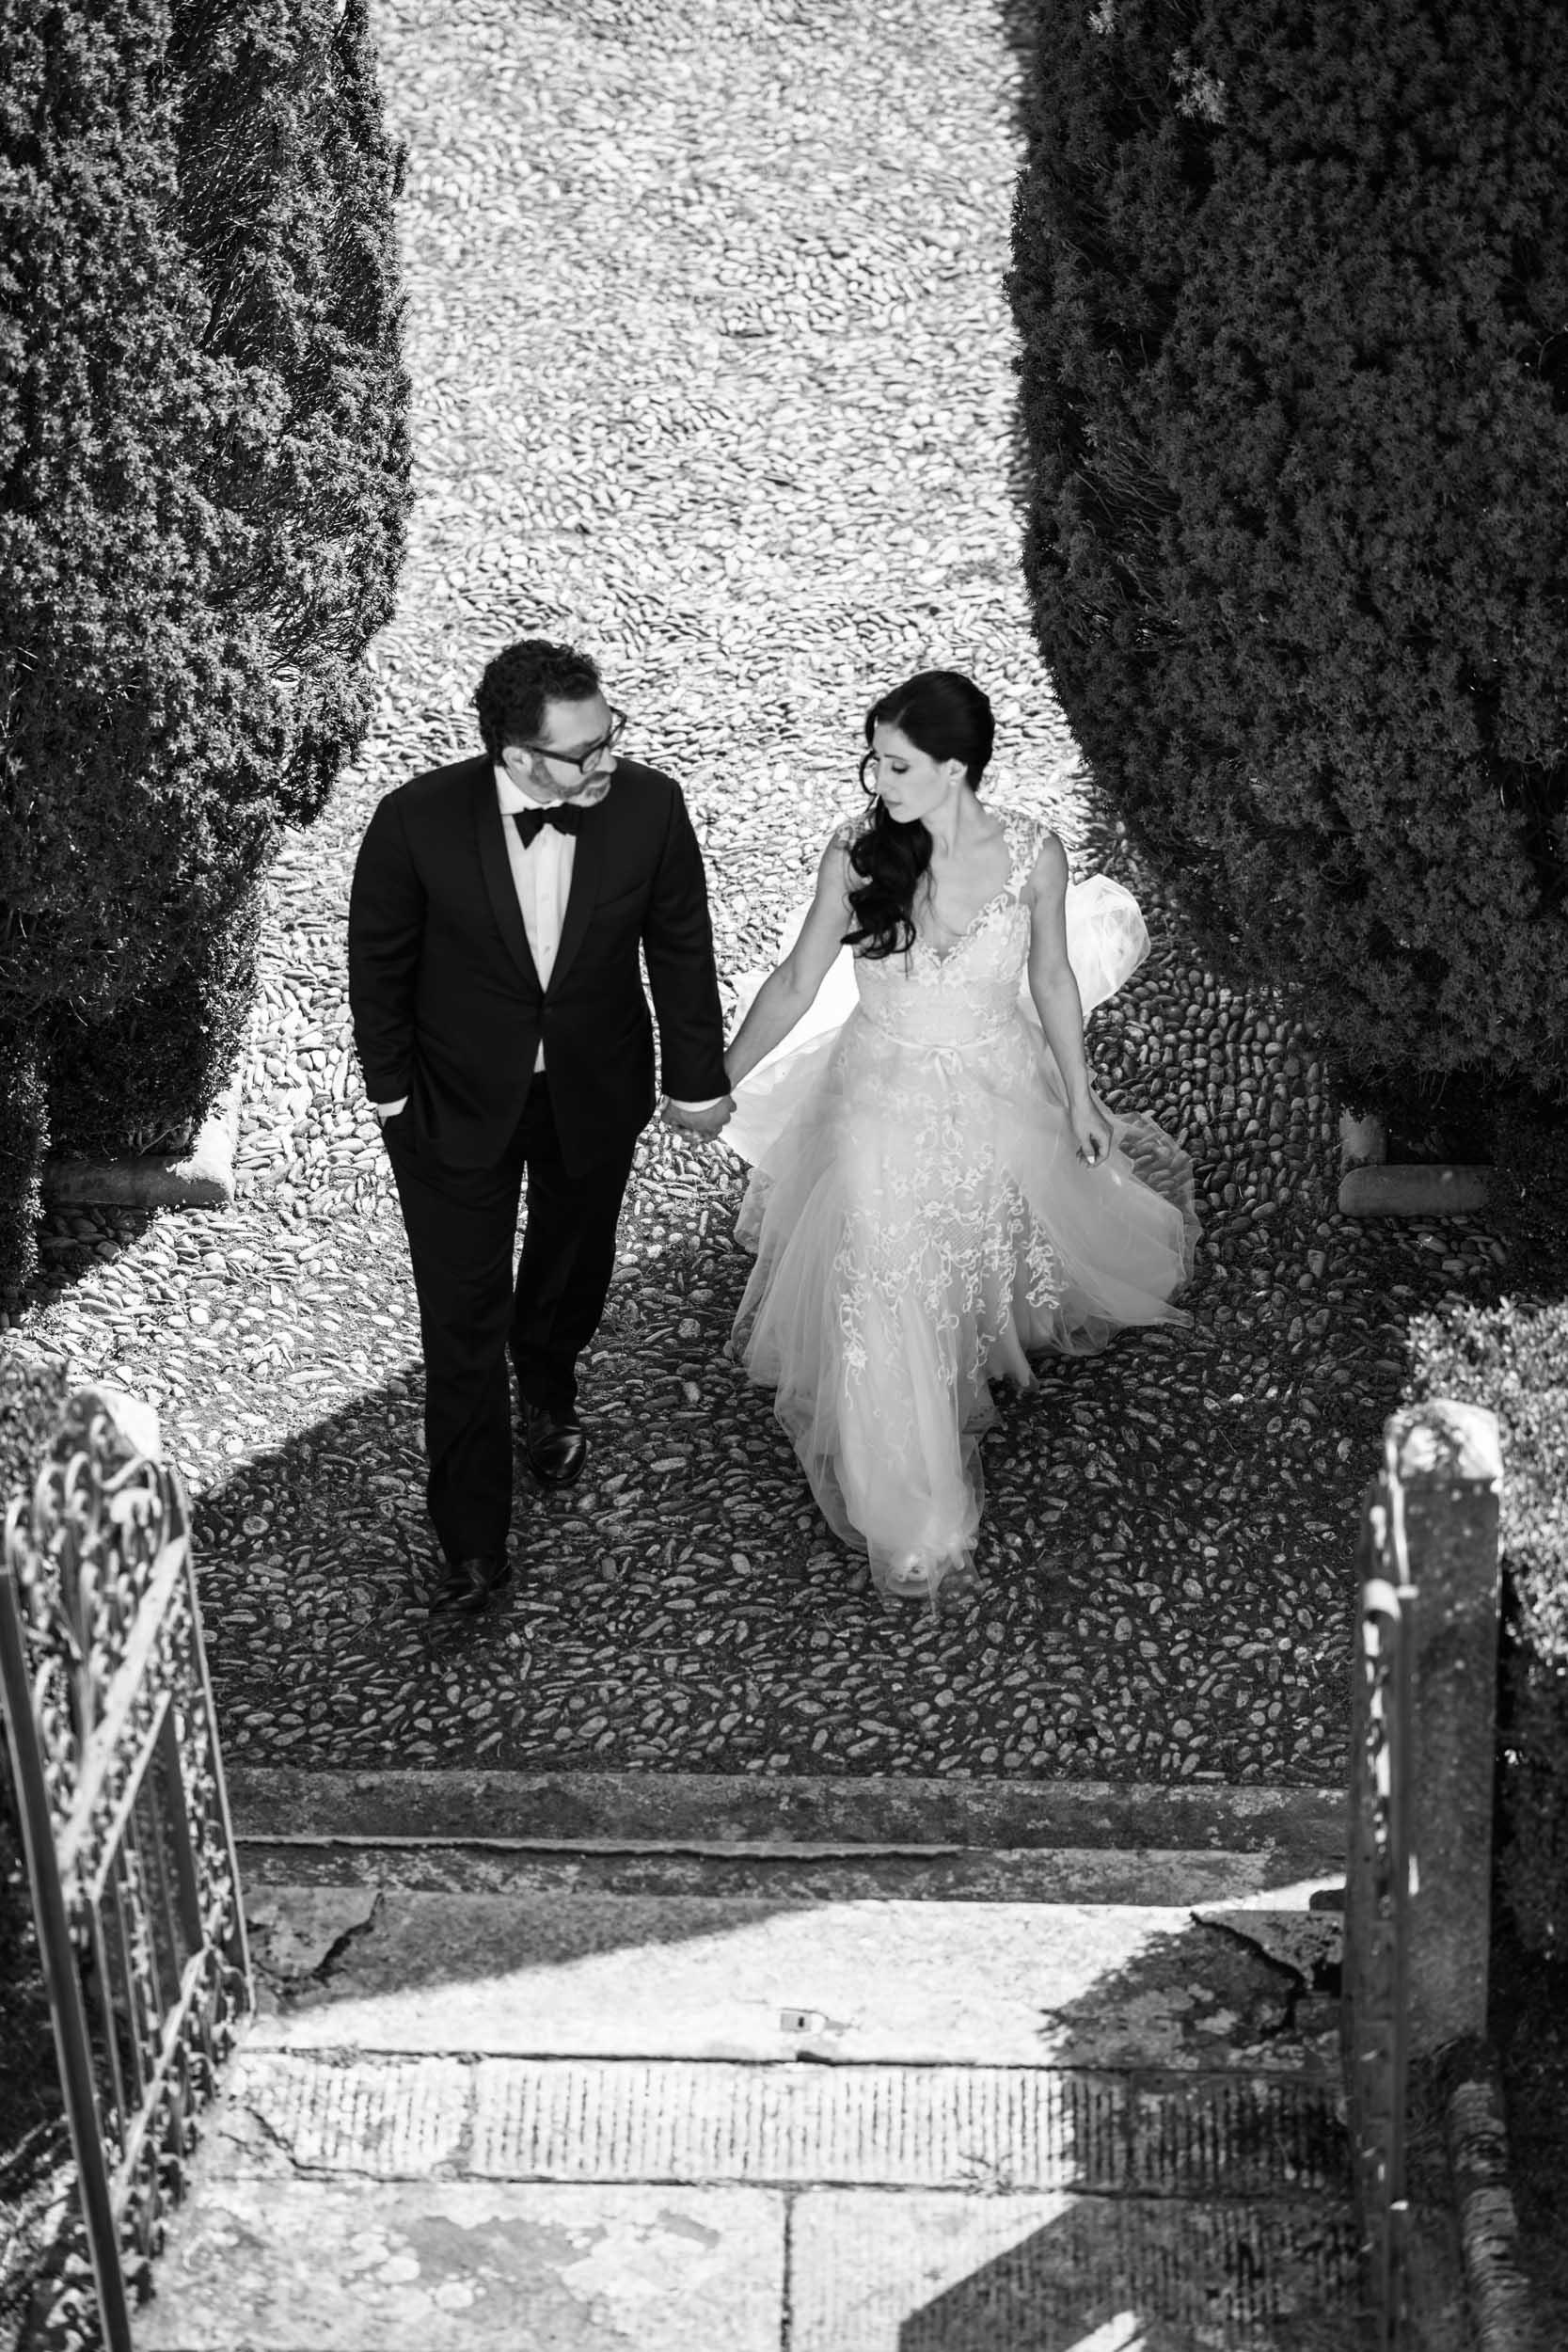 villa-gamberaia-florence-italy-destination-wedding-26.jpg